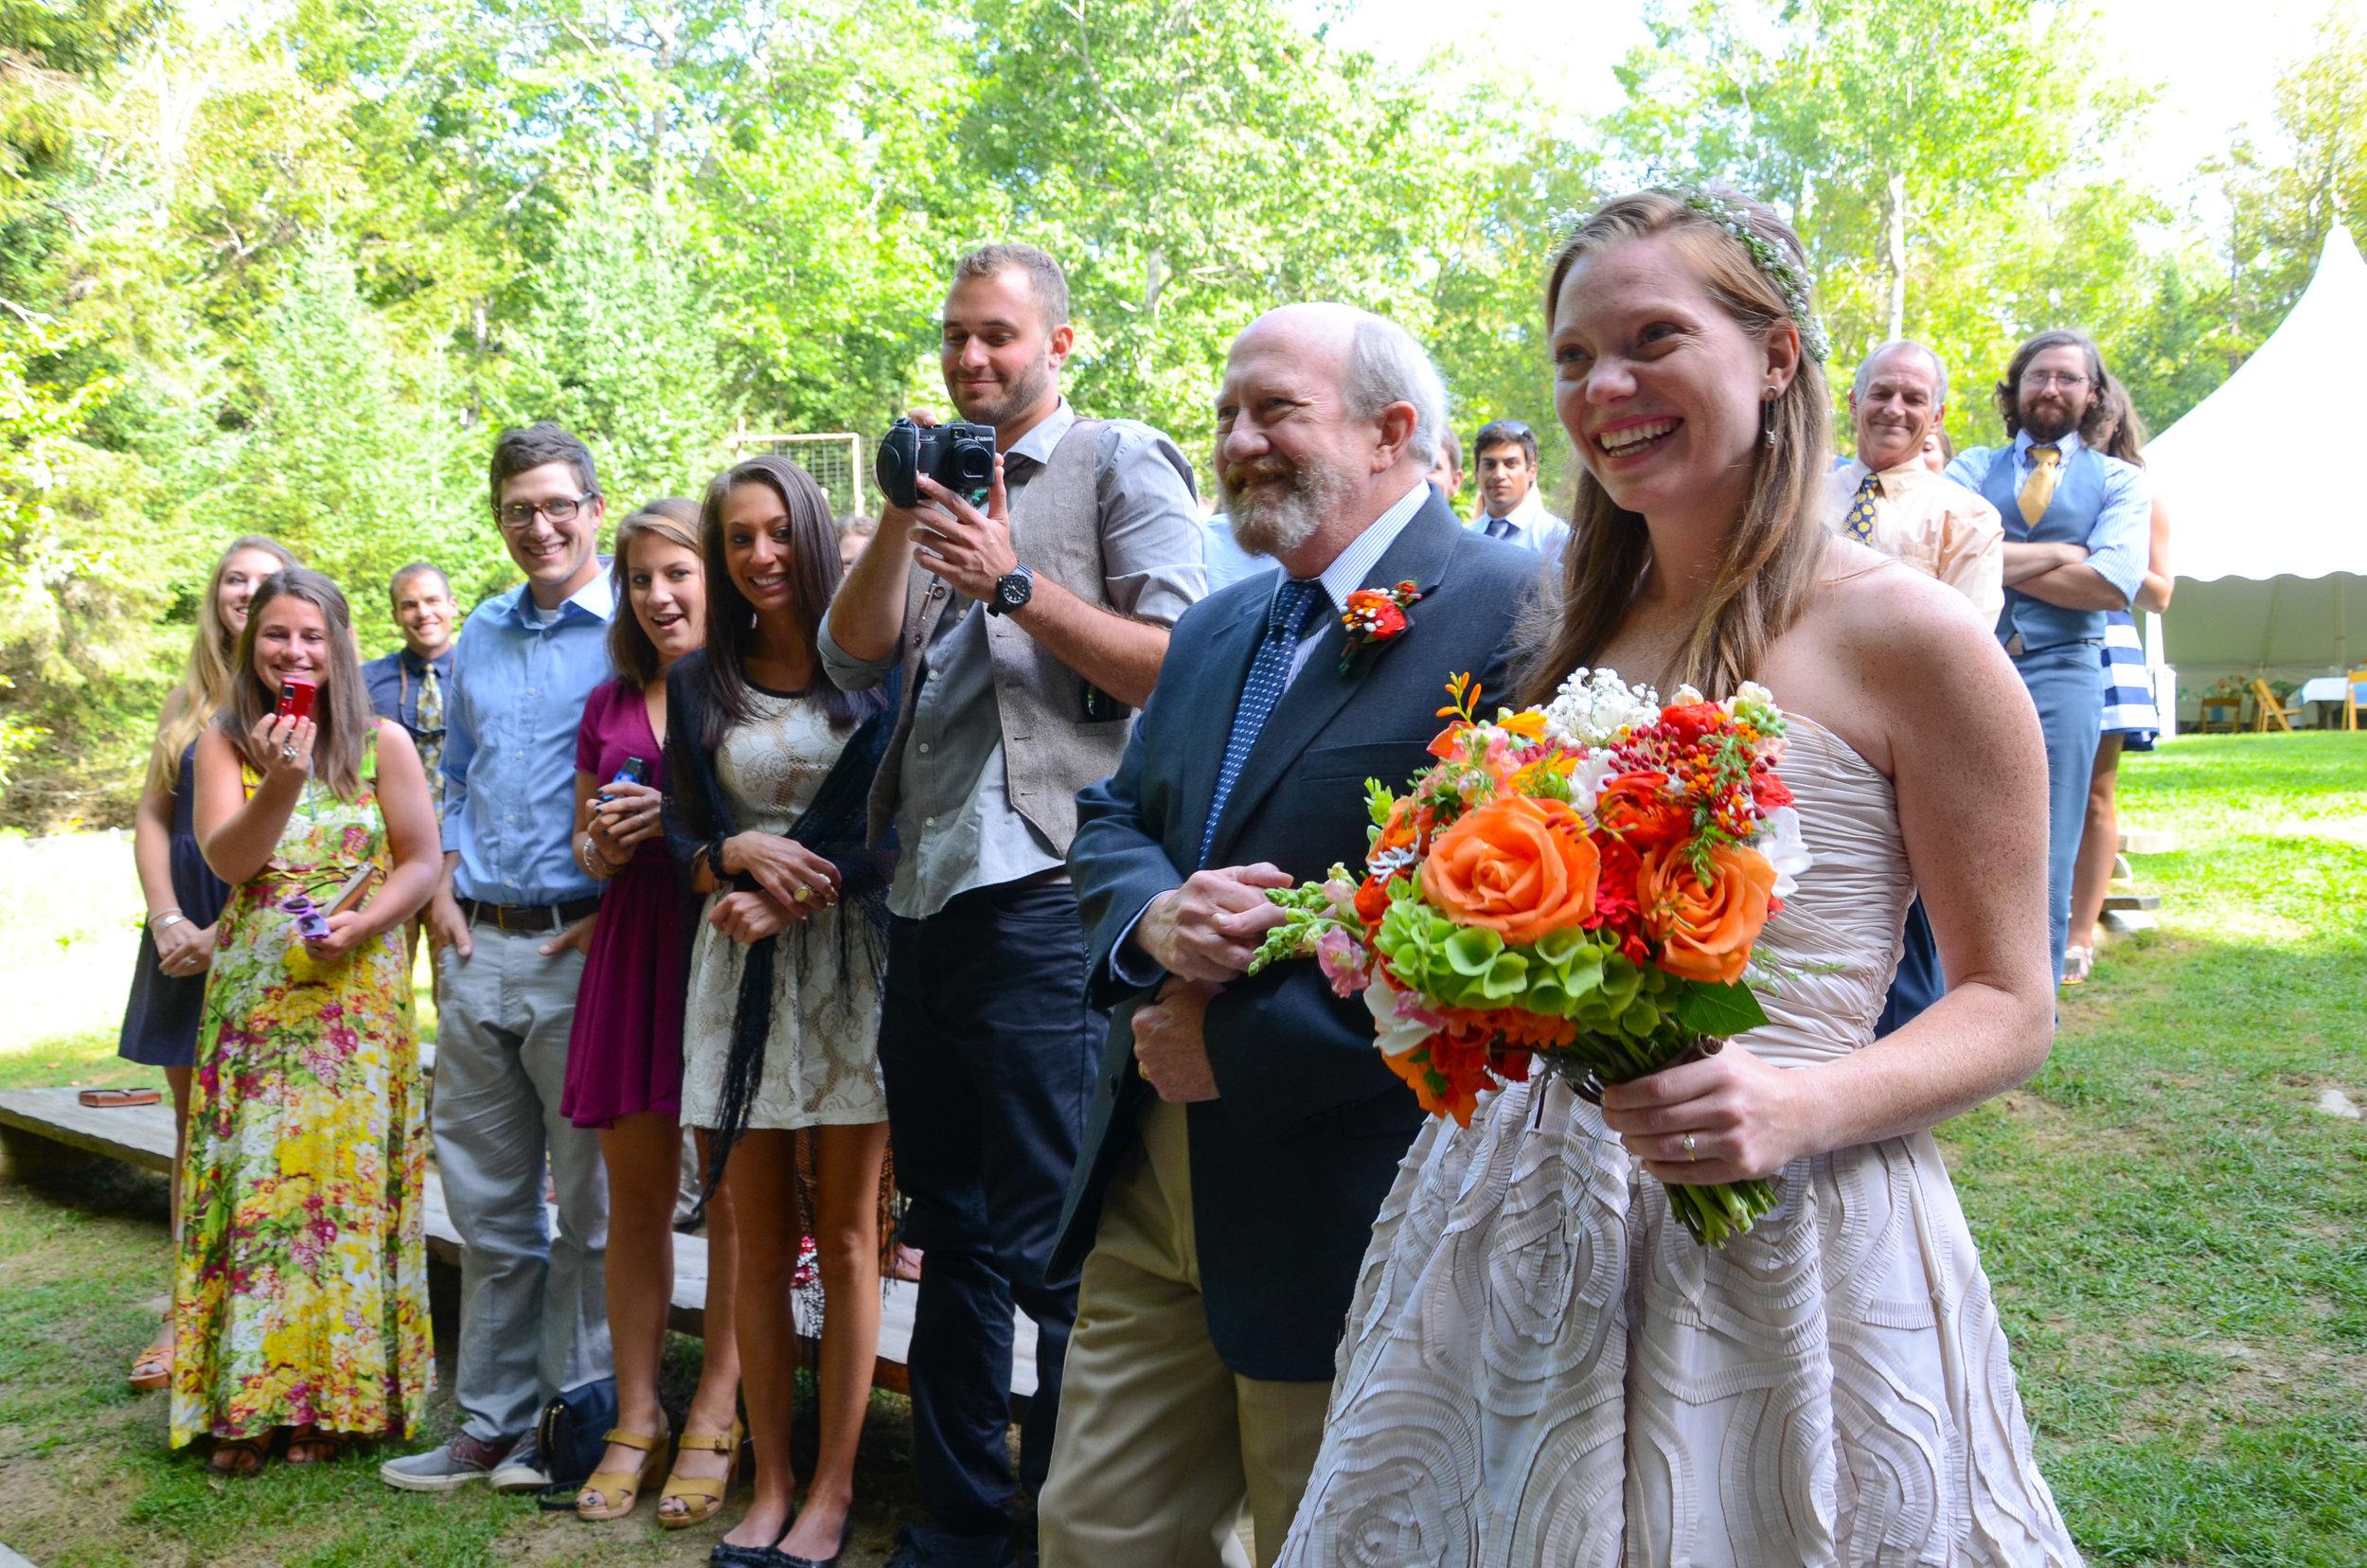 Jessie asked the florist to make an orange bouquet